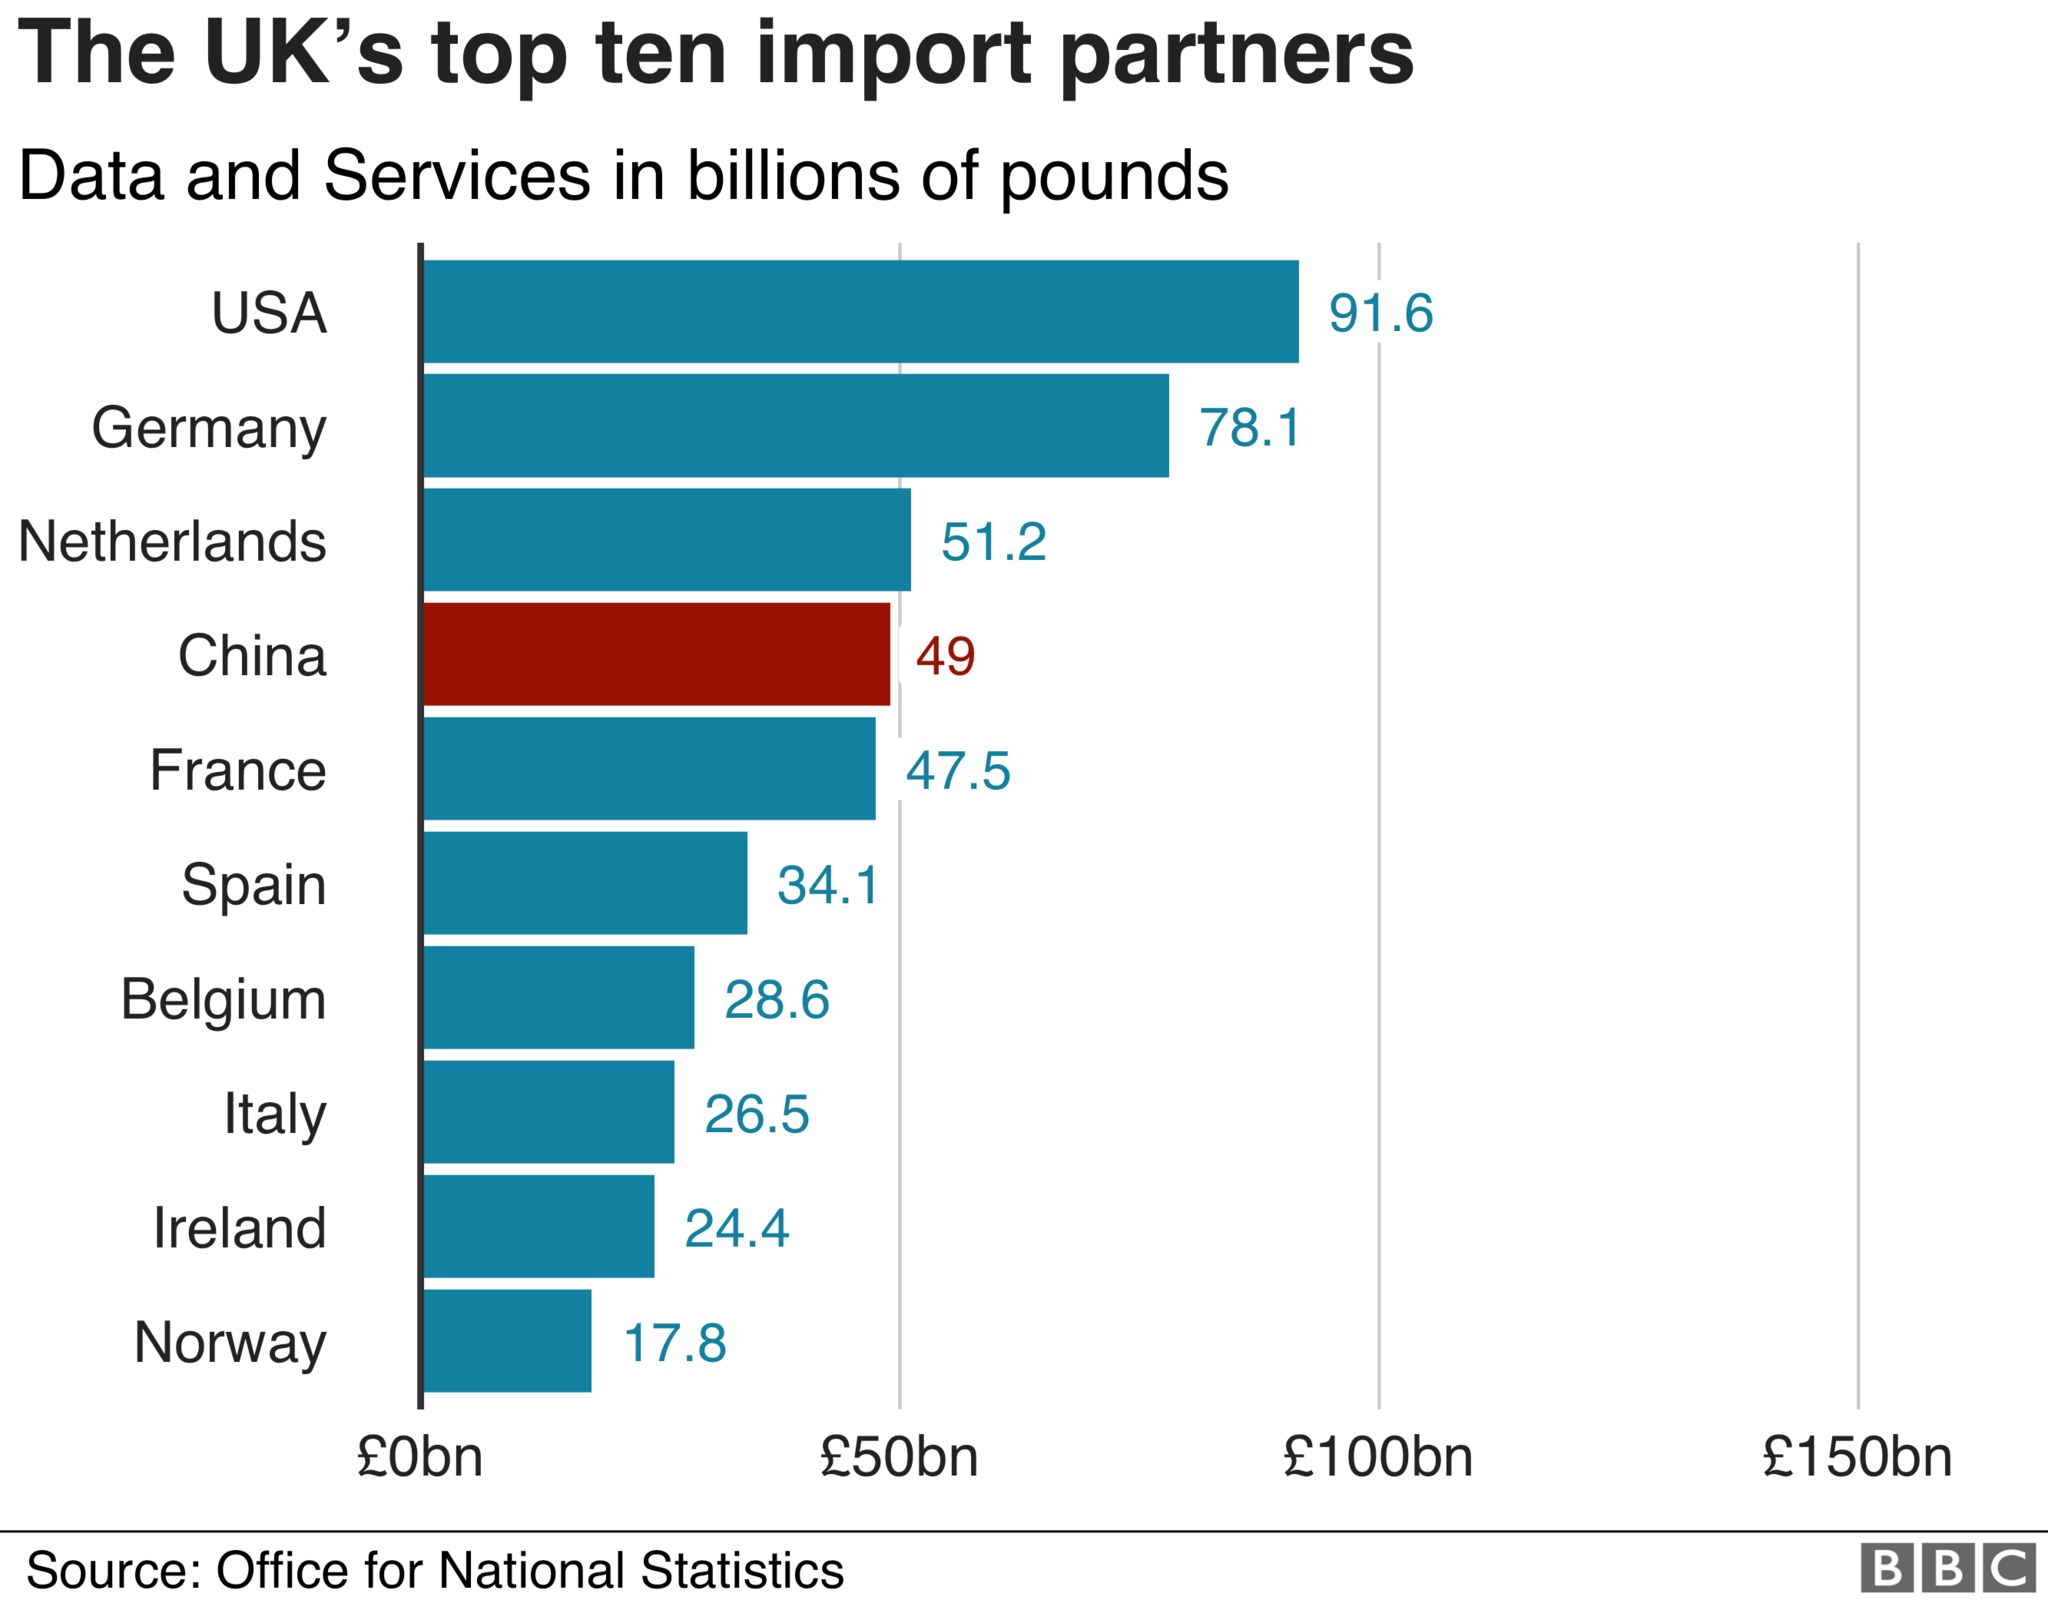 Import partners